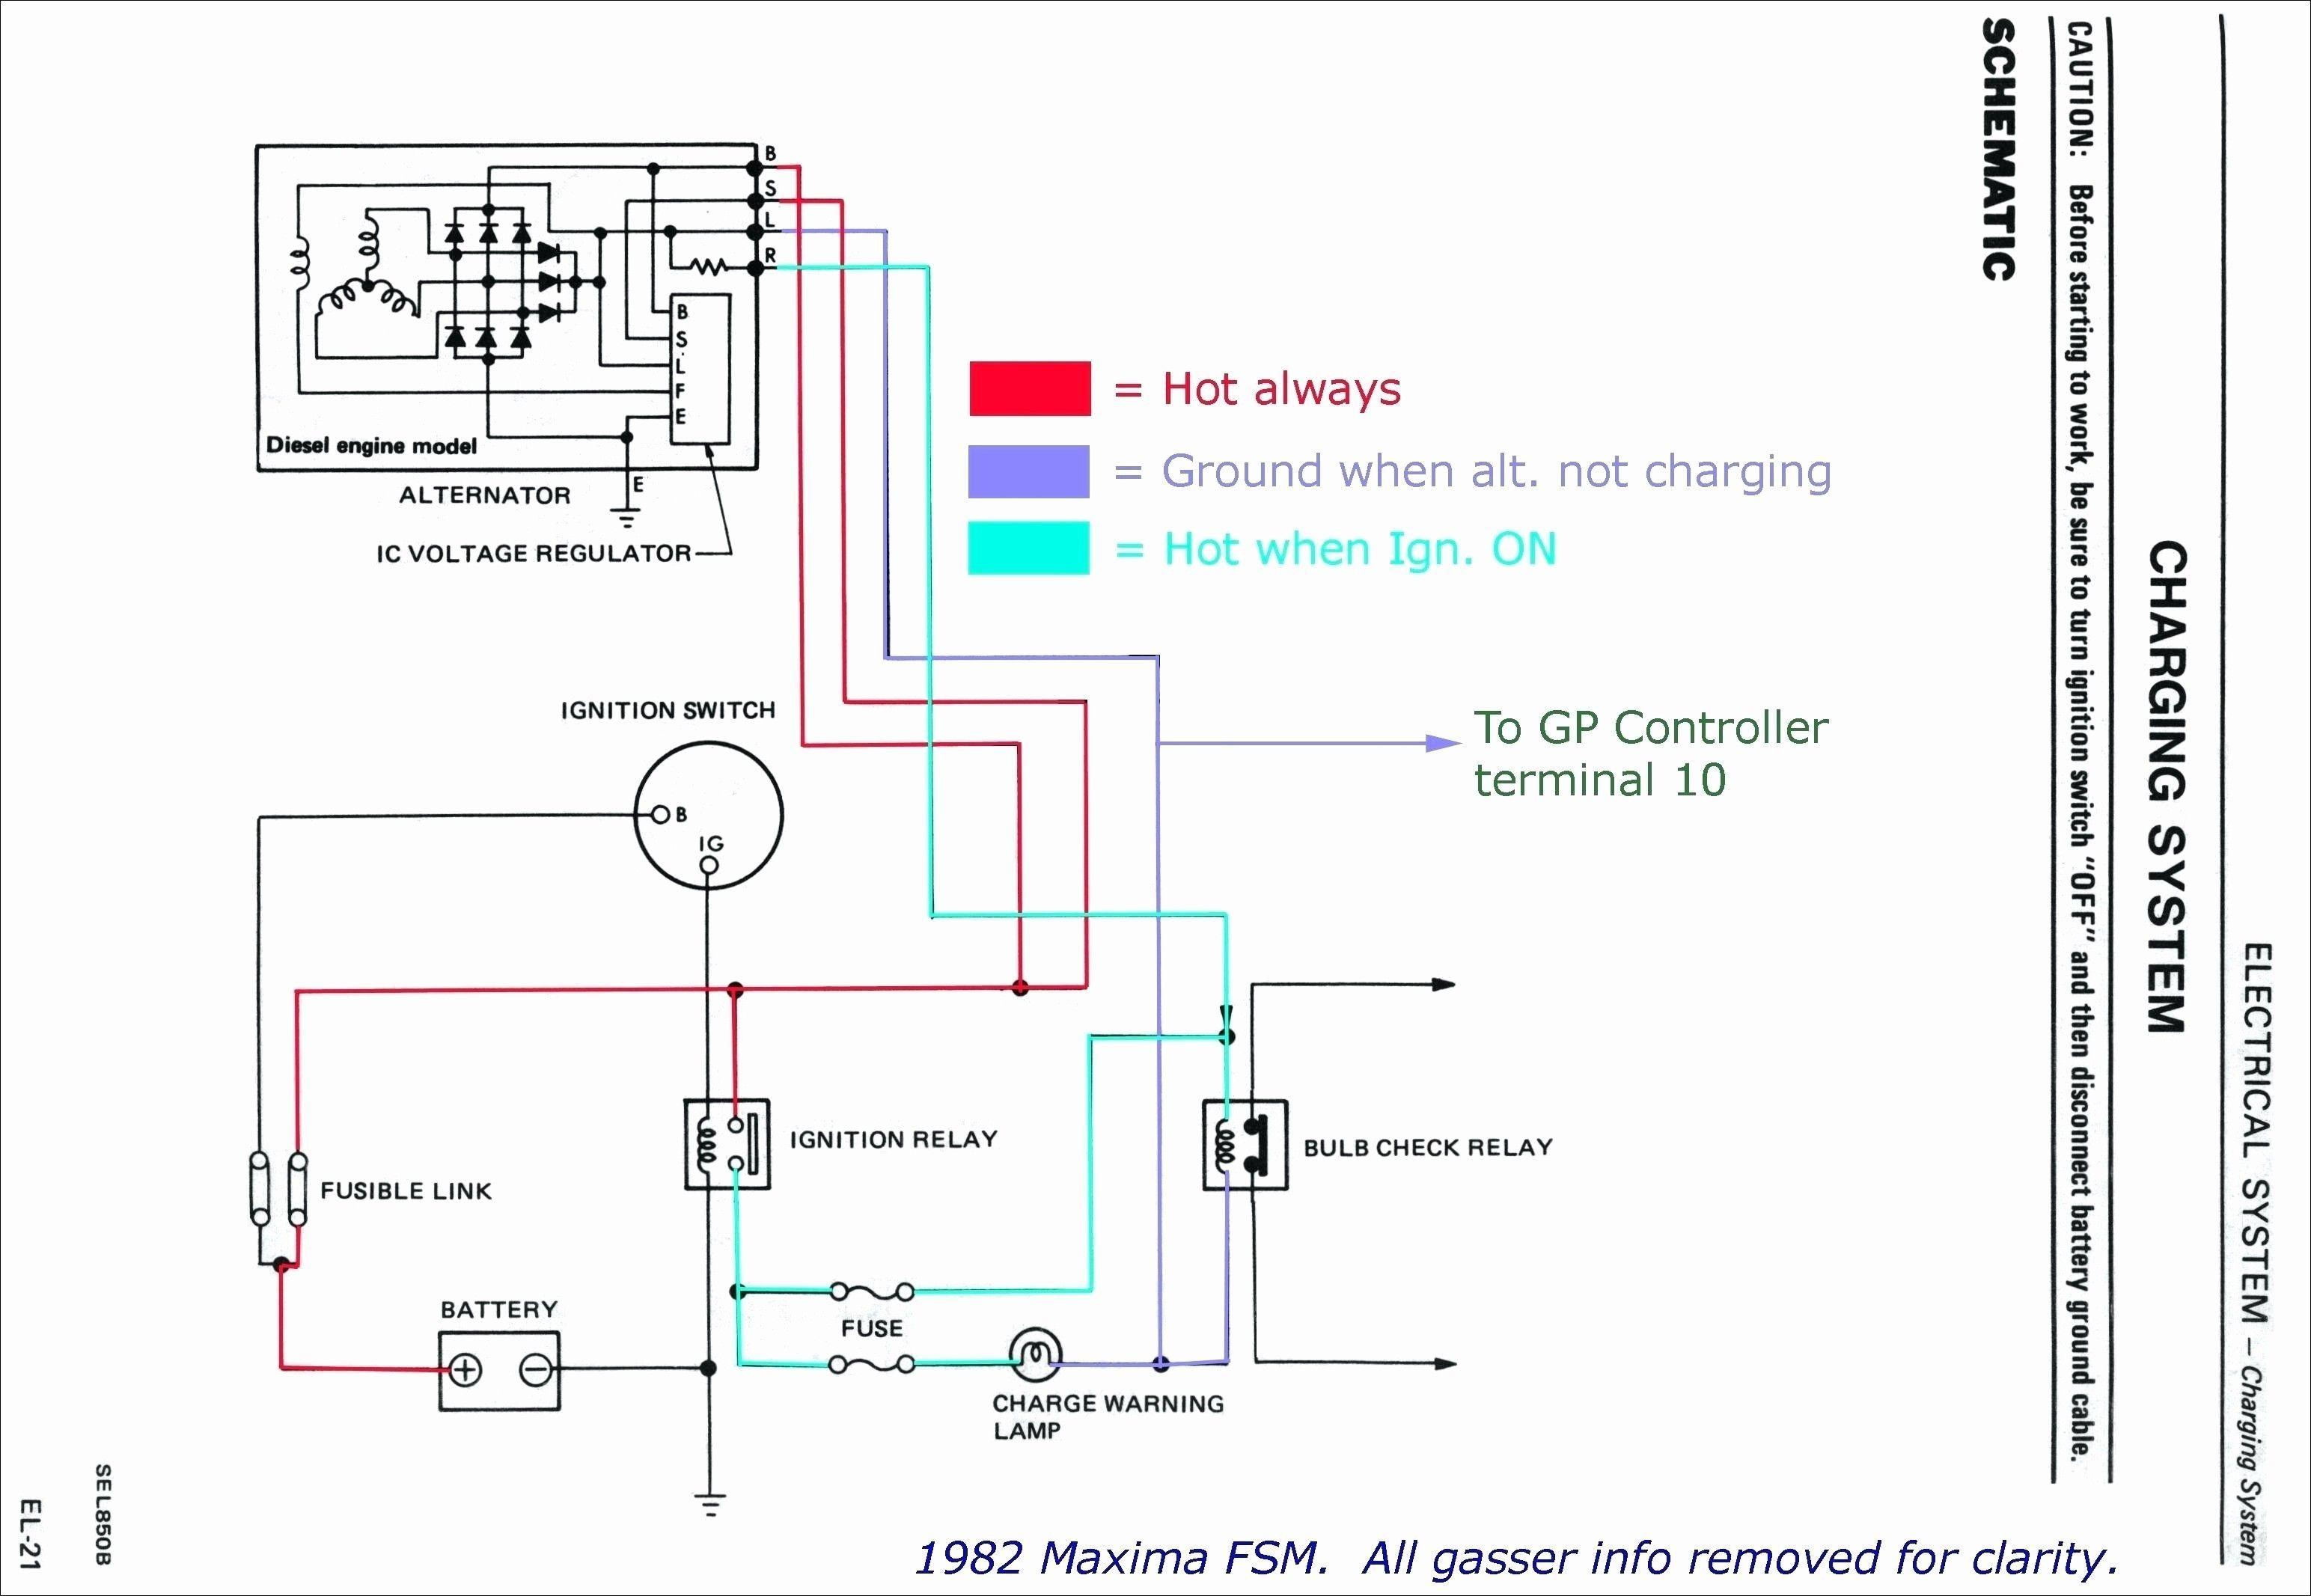 Alternator Warning Light Wiring Schematic And Wiring Diagram Alternator Bmw E46 Electrical Diagram